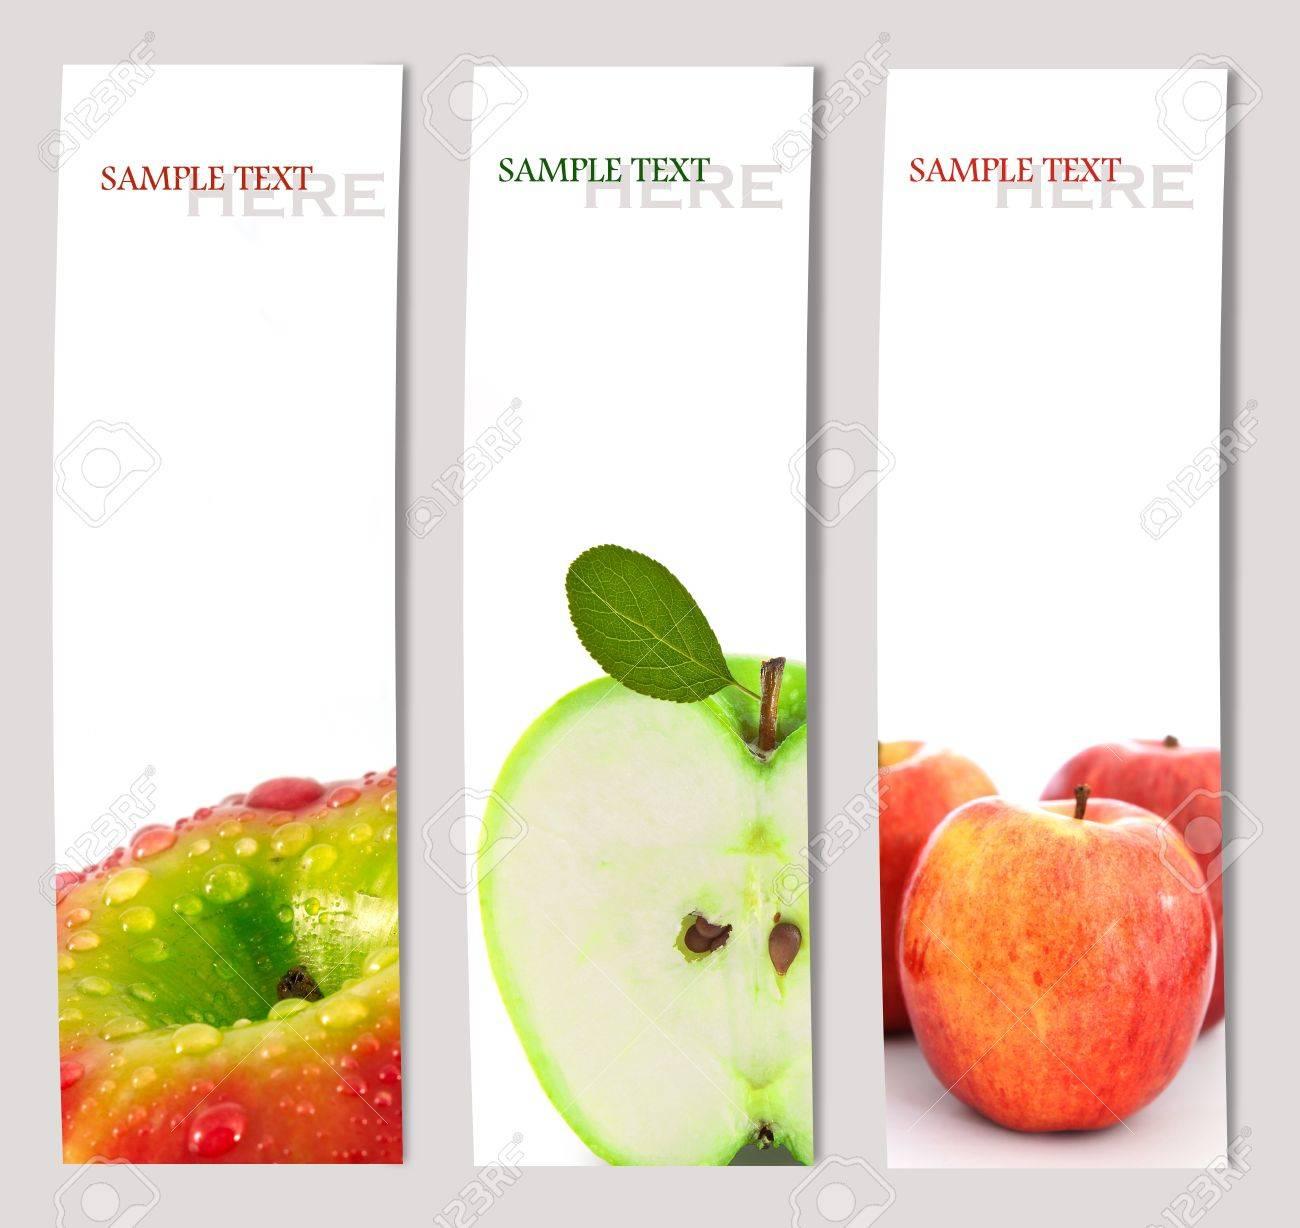 Design background of apple brochure  template Stock Photo - 14871368